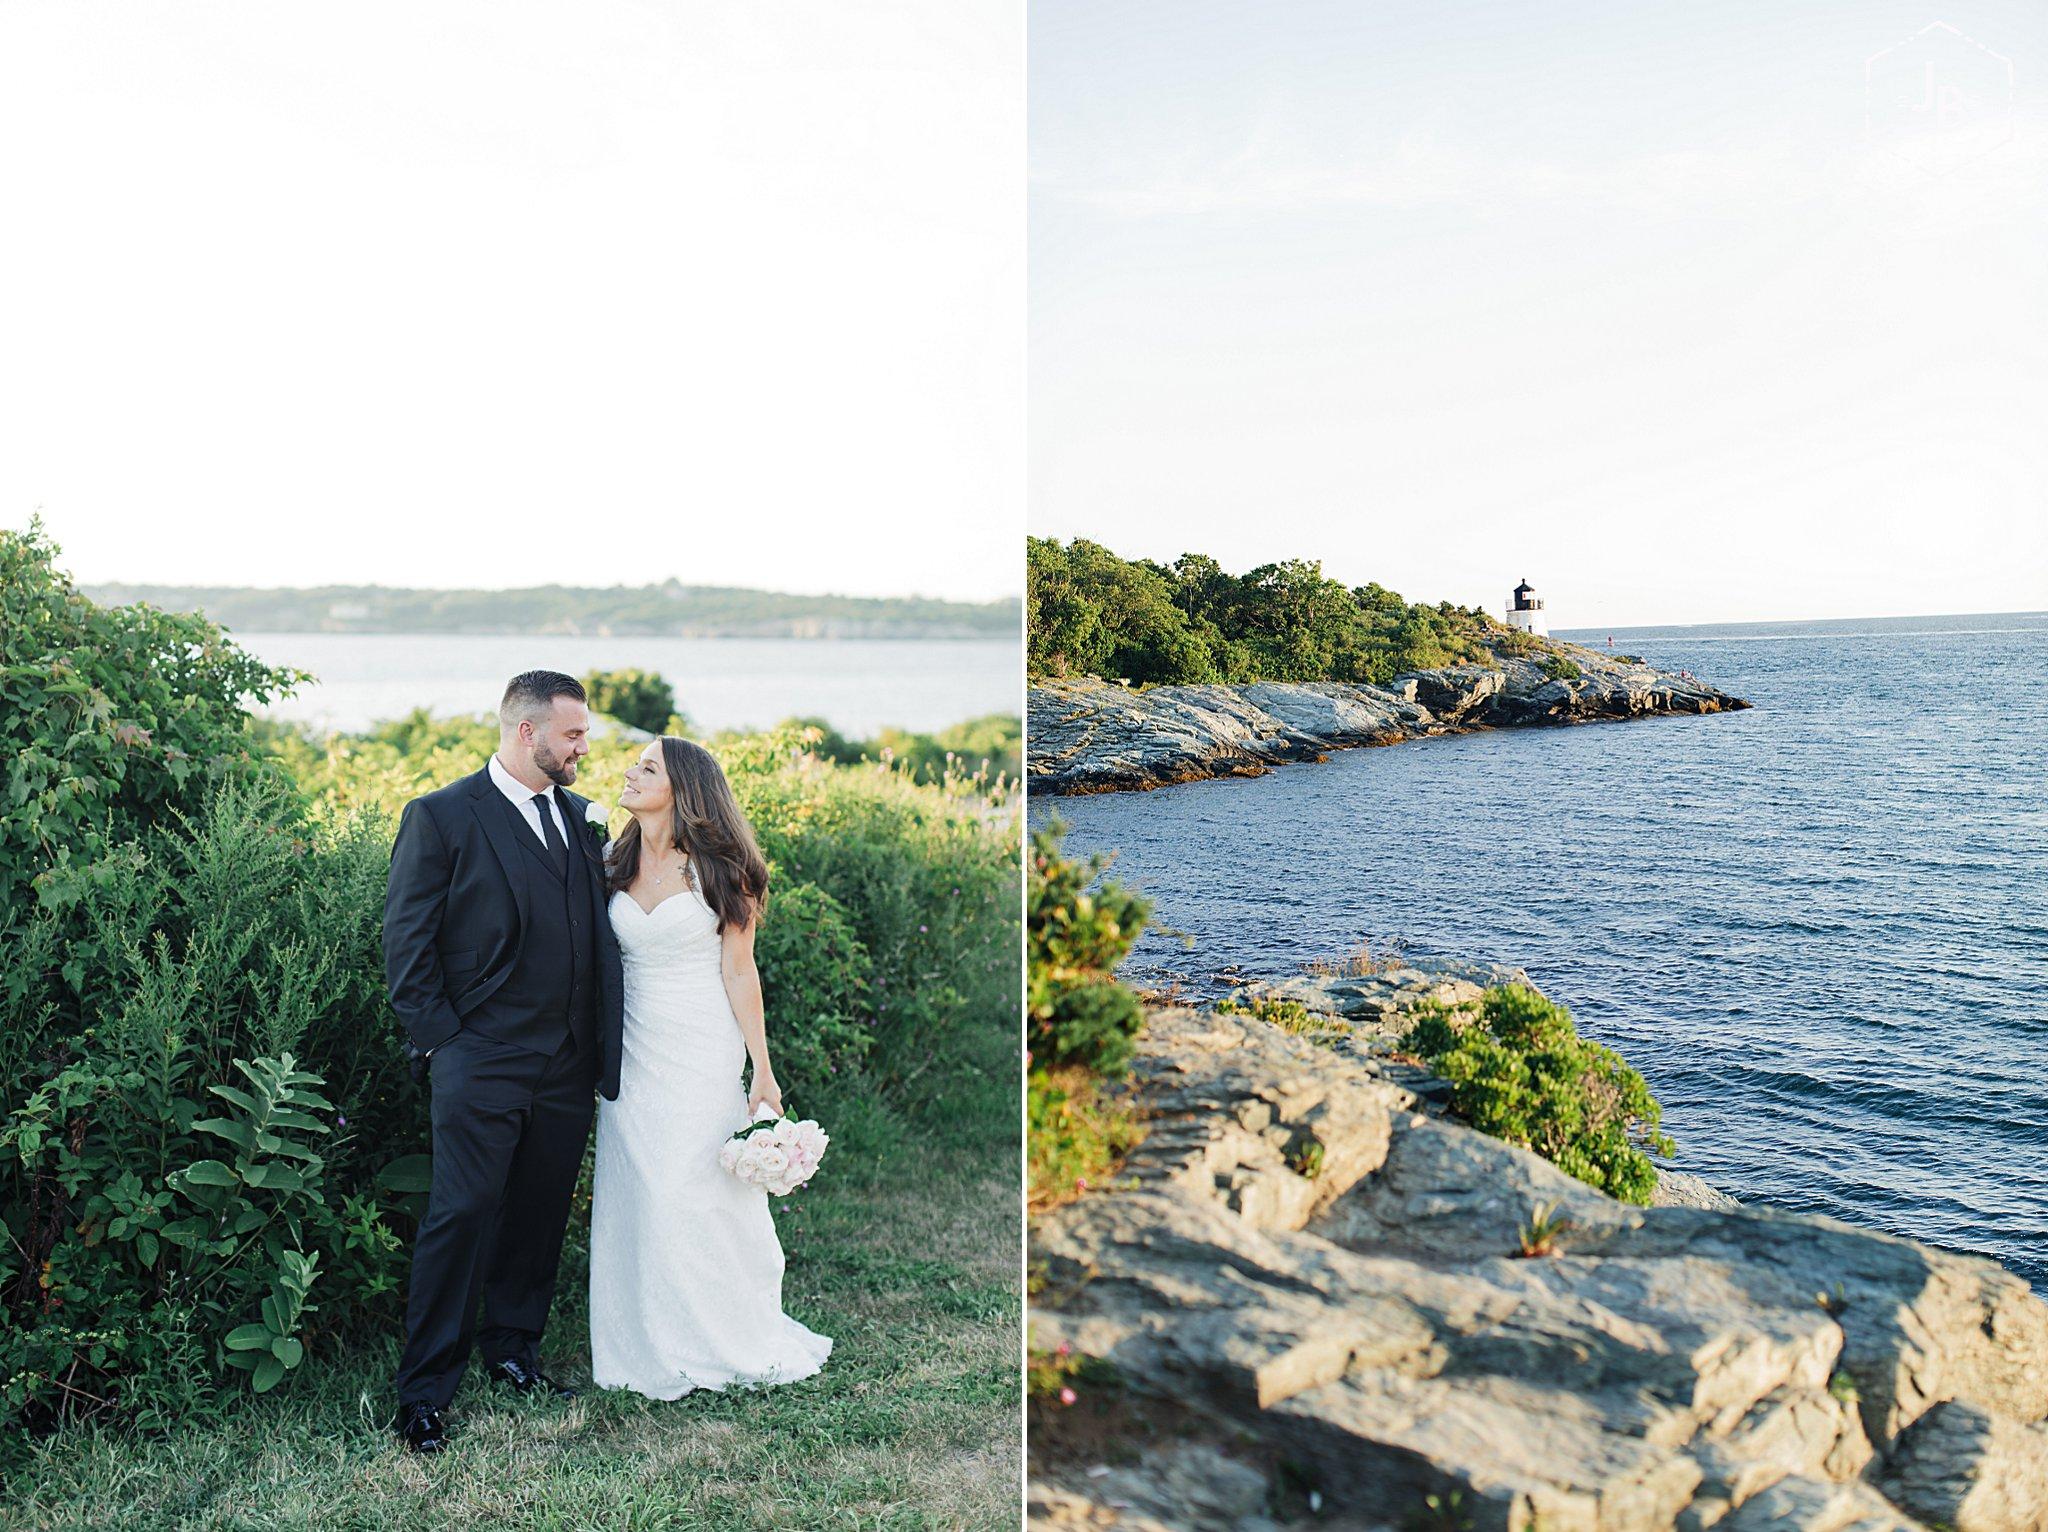 WeddingandEngagementFloridaPhotographer_2927.jpg